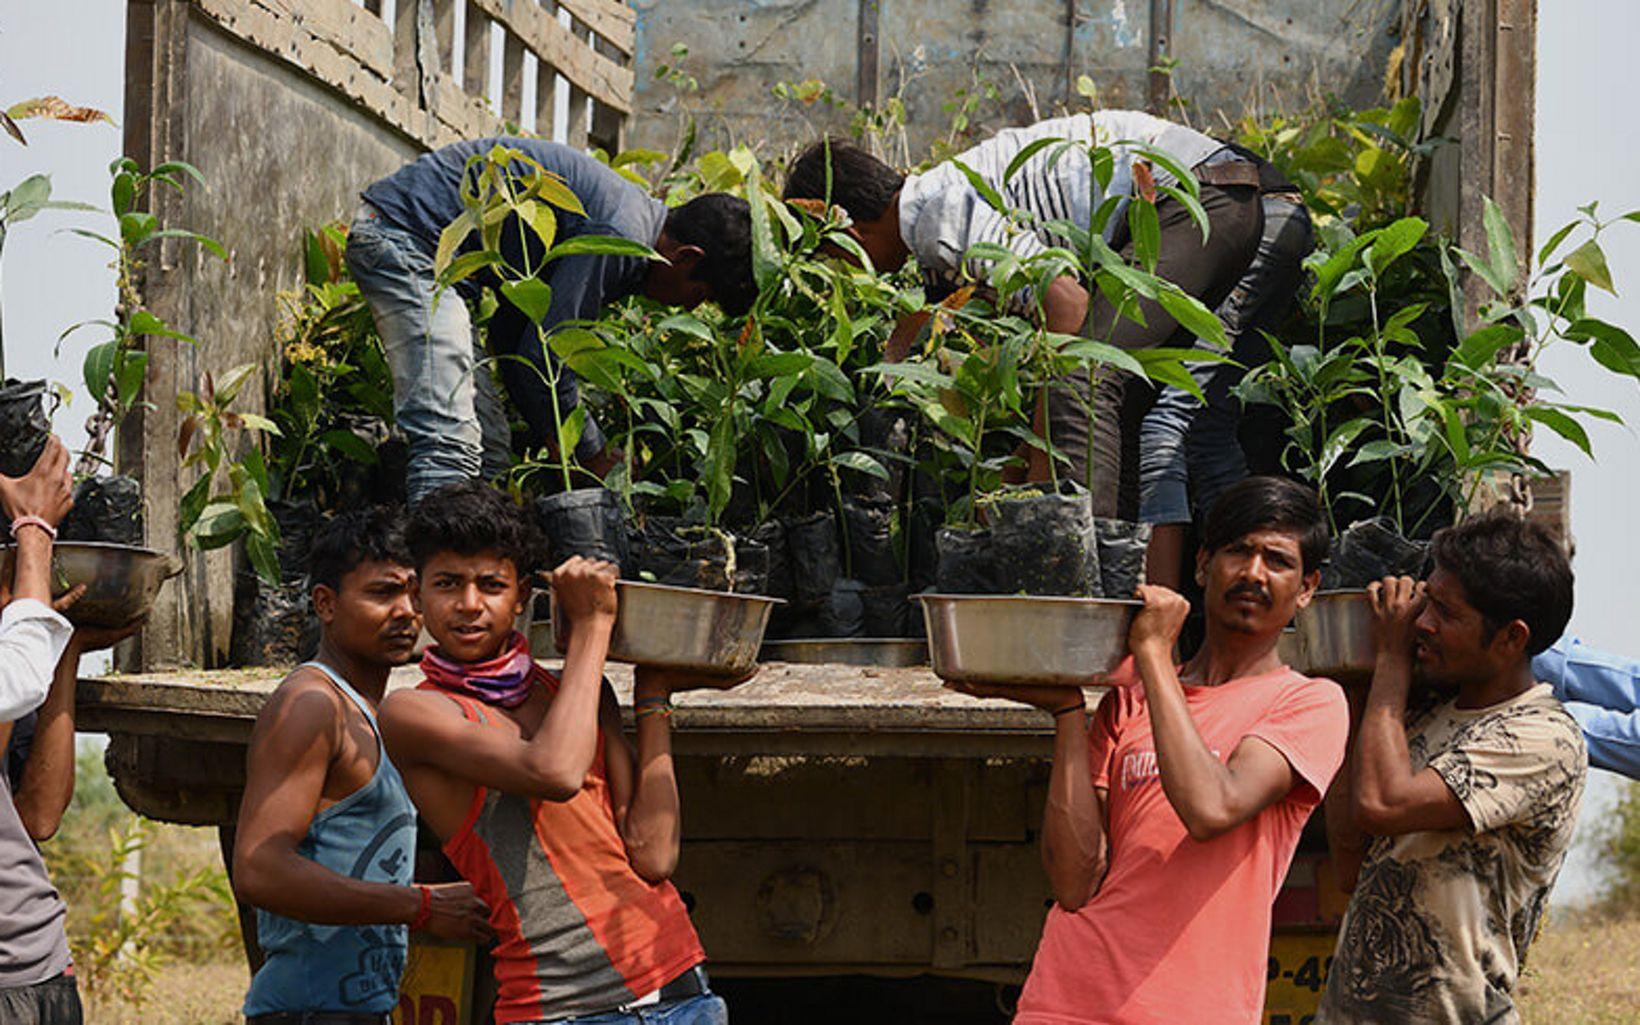 of Ajera, Madhya Pradesh to improve 3 km of Narmada's riverbanks by planting and nurturing native plants.